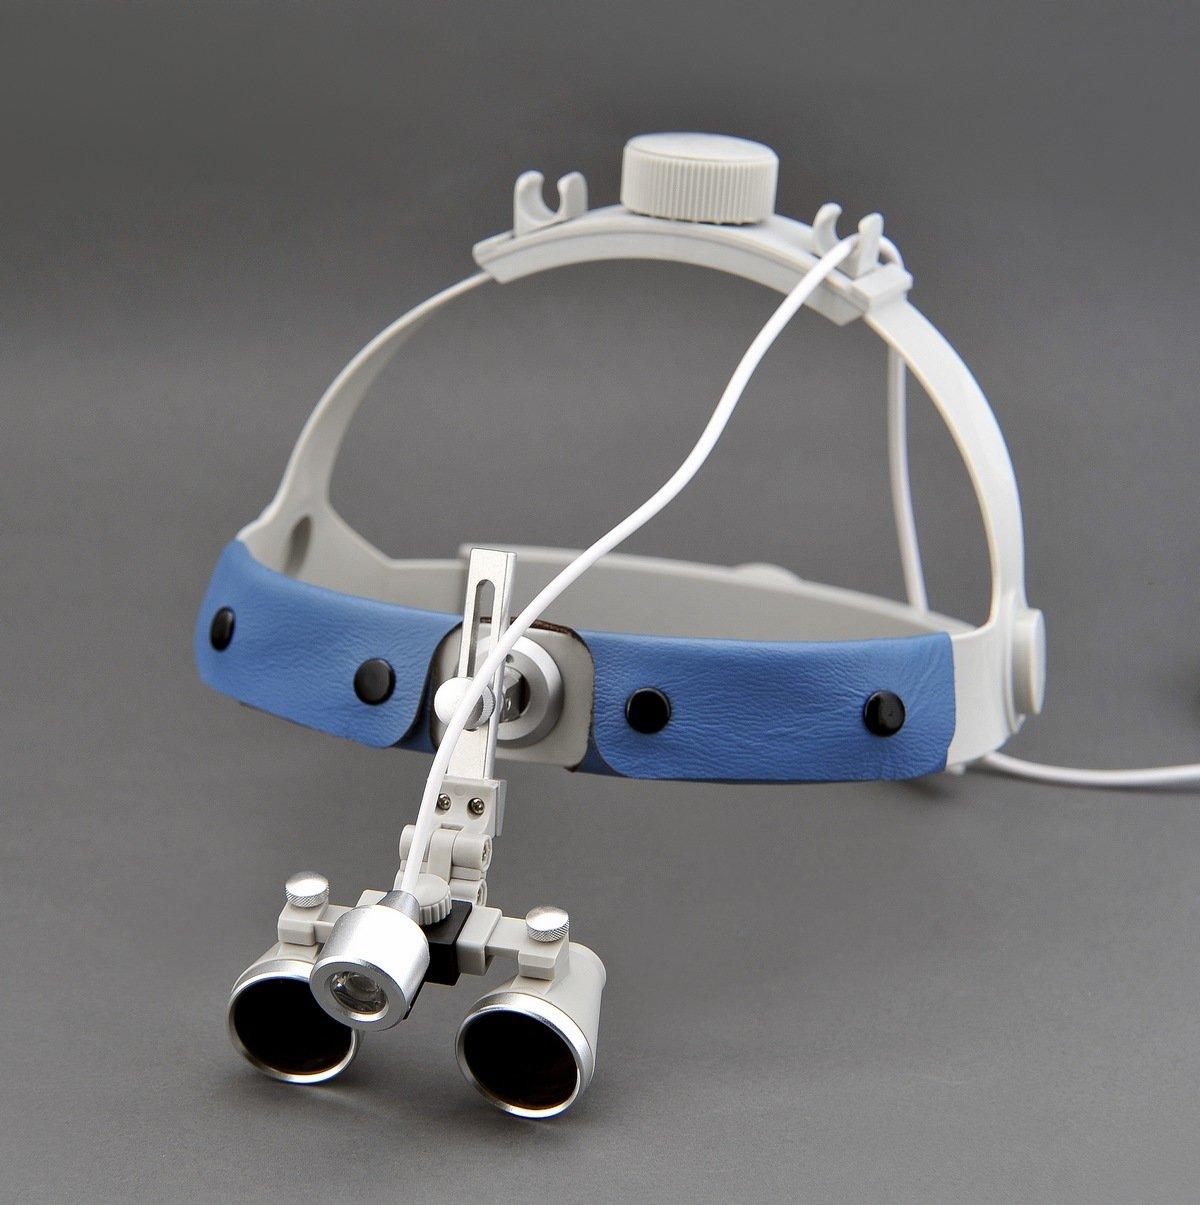 Songzi Optics (2.5X,3X,3.5X Optional) Headband Binocular Medical Surgical Dental Loupes For glasses wearer & SZ-1 Headlight (working distance :(360 - 460 mm)R, Magnification: 2.5X)